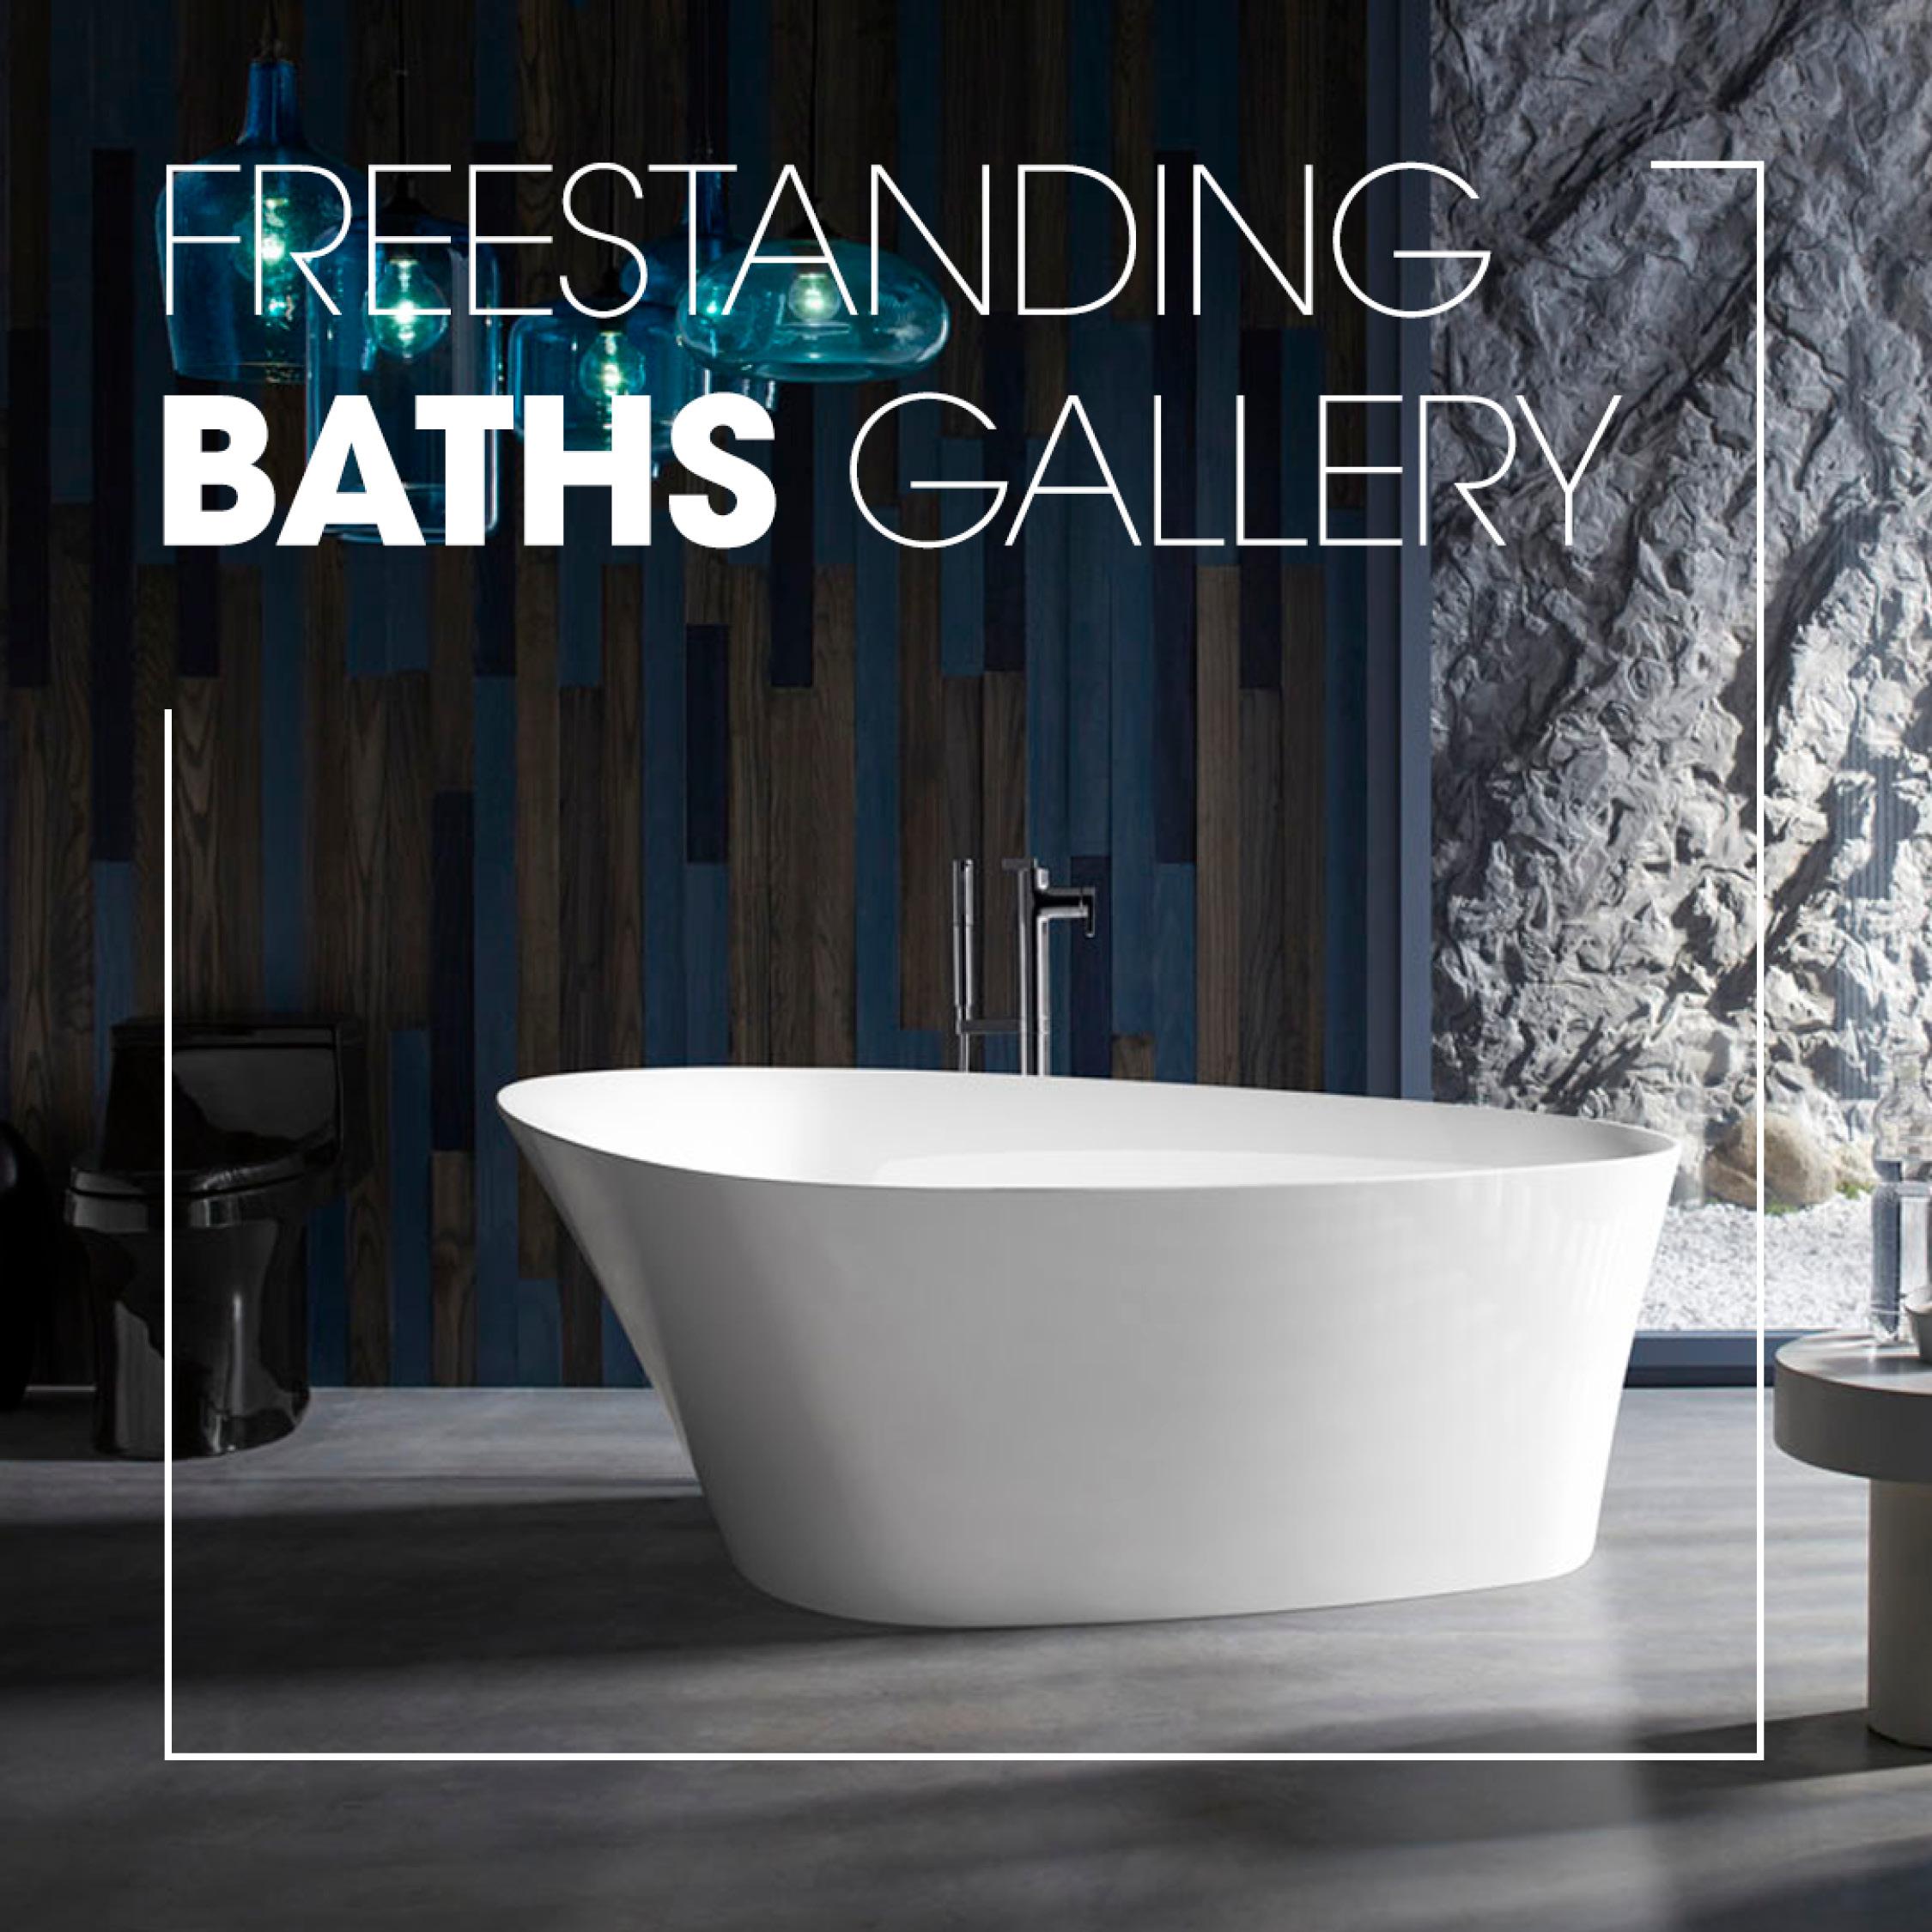 Freestanding Bath Gallery   Kohler Ideas